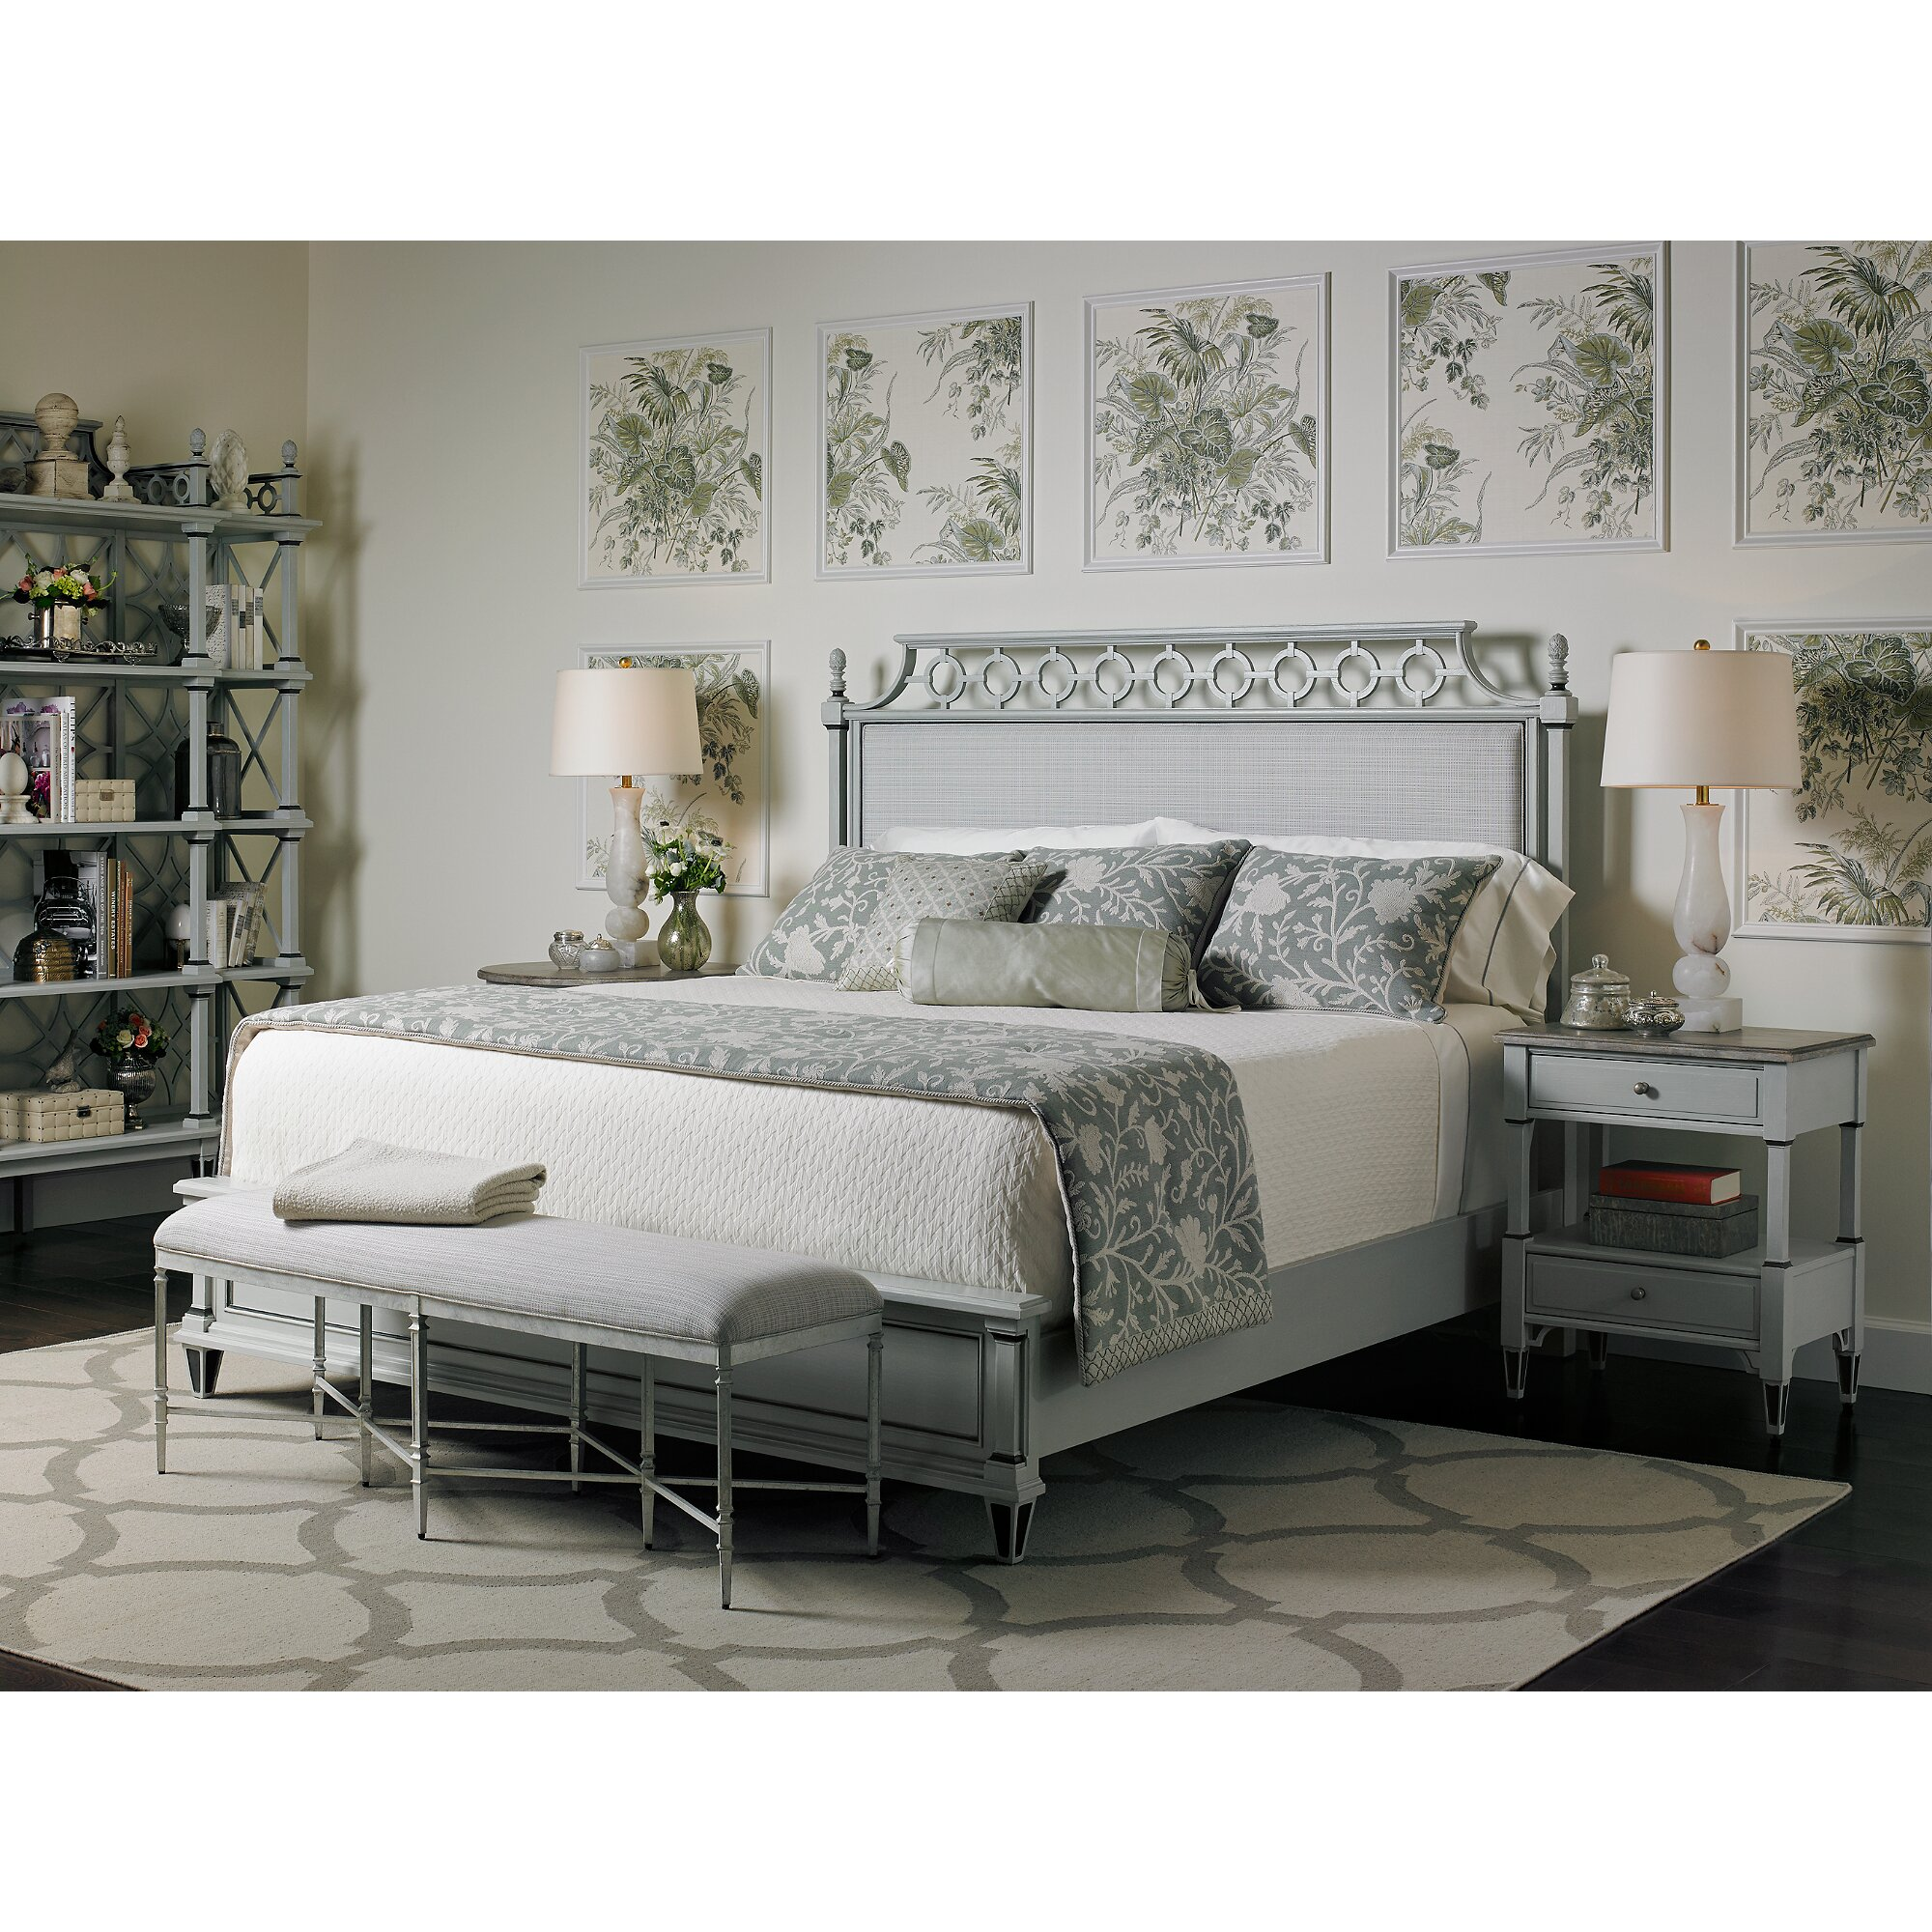 Stanley Bedroom Furniture Stanley Preserve Platform Bed Reviews Wayfair